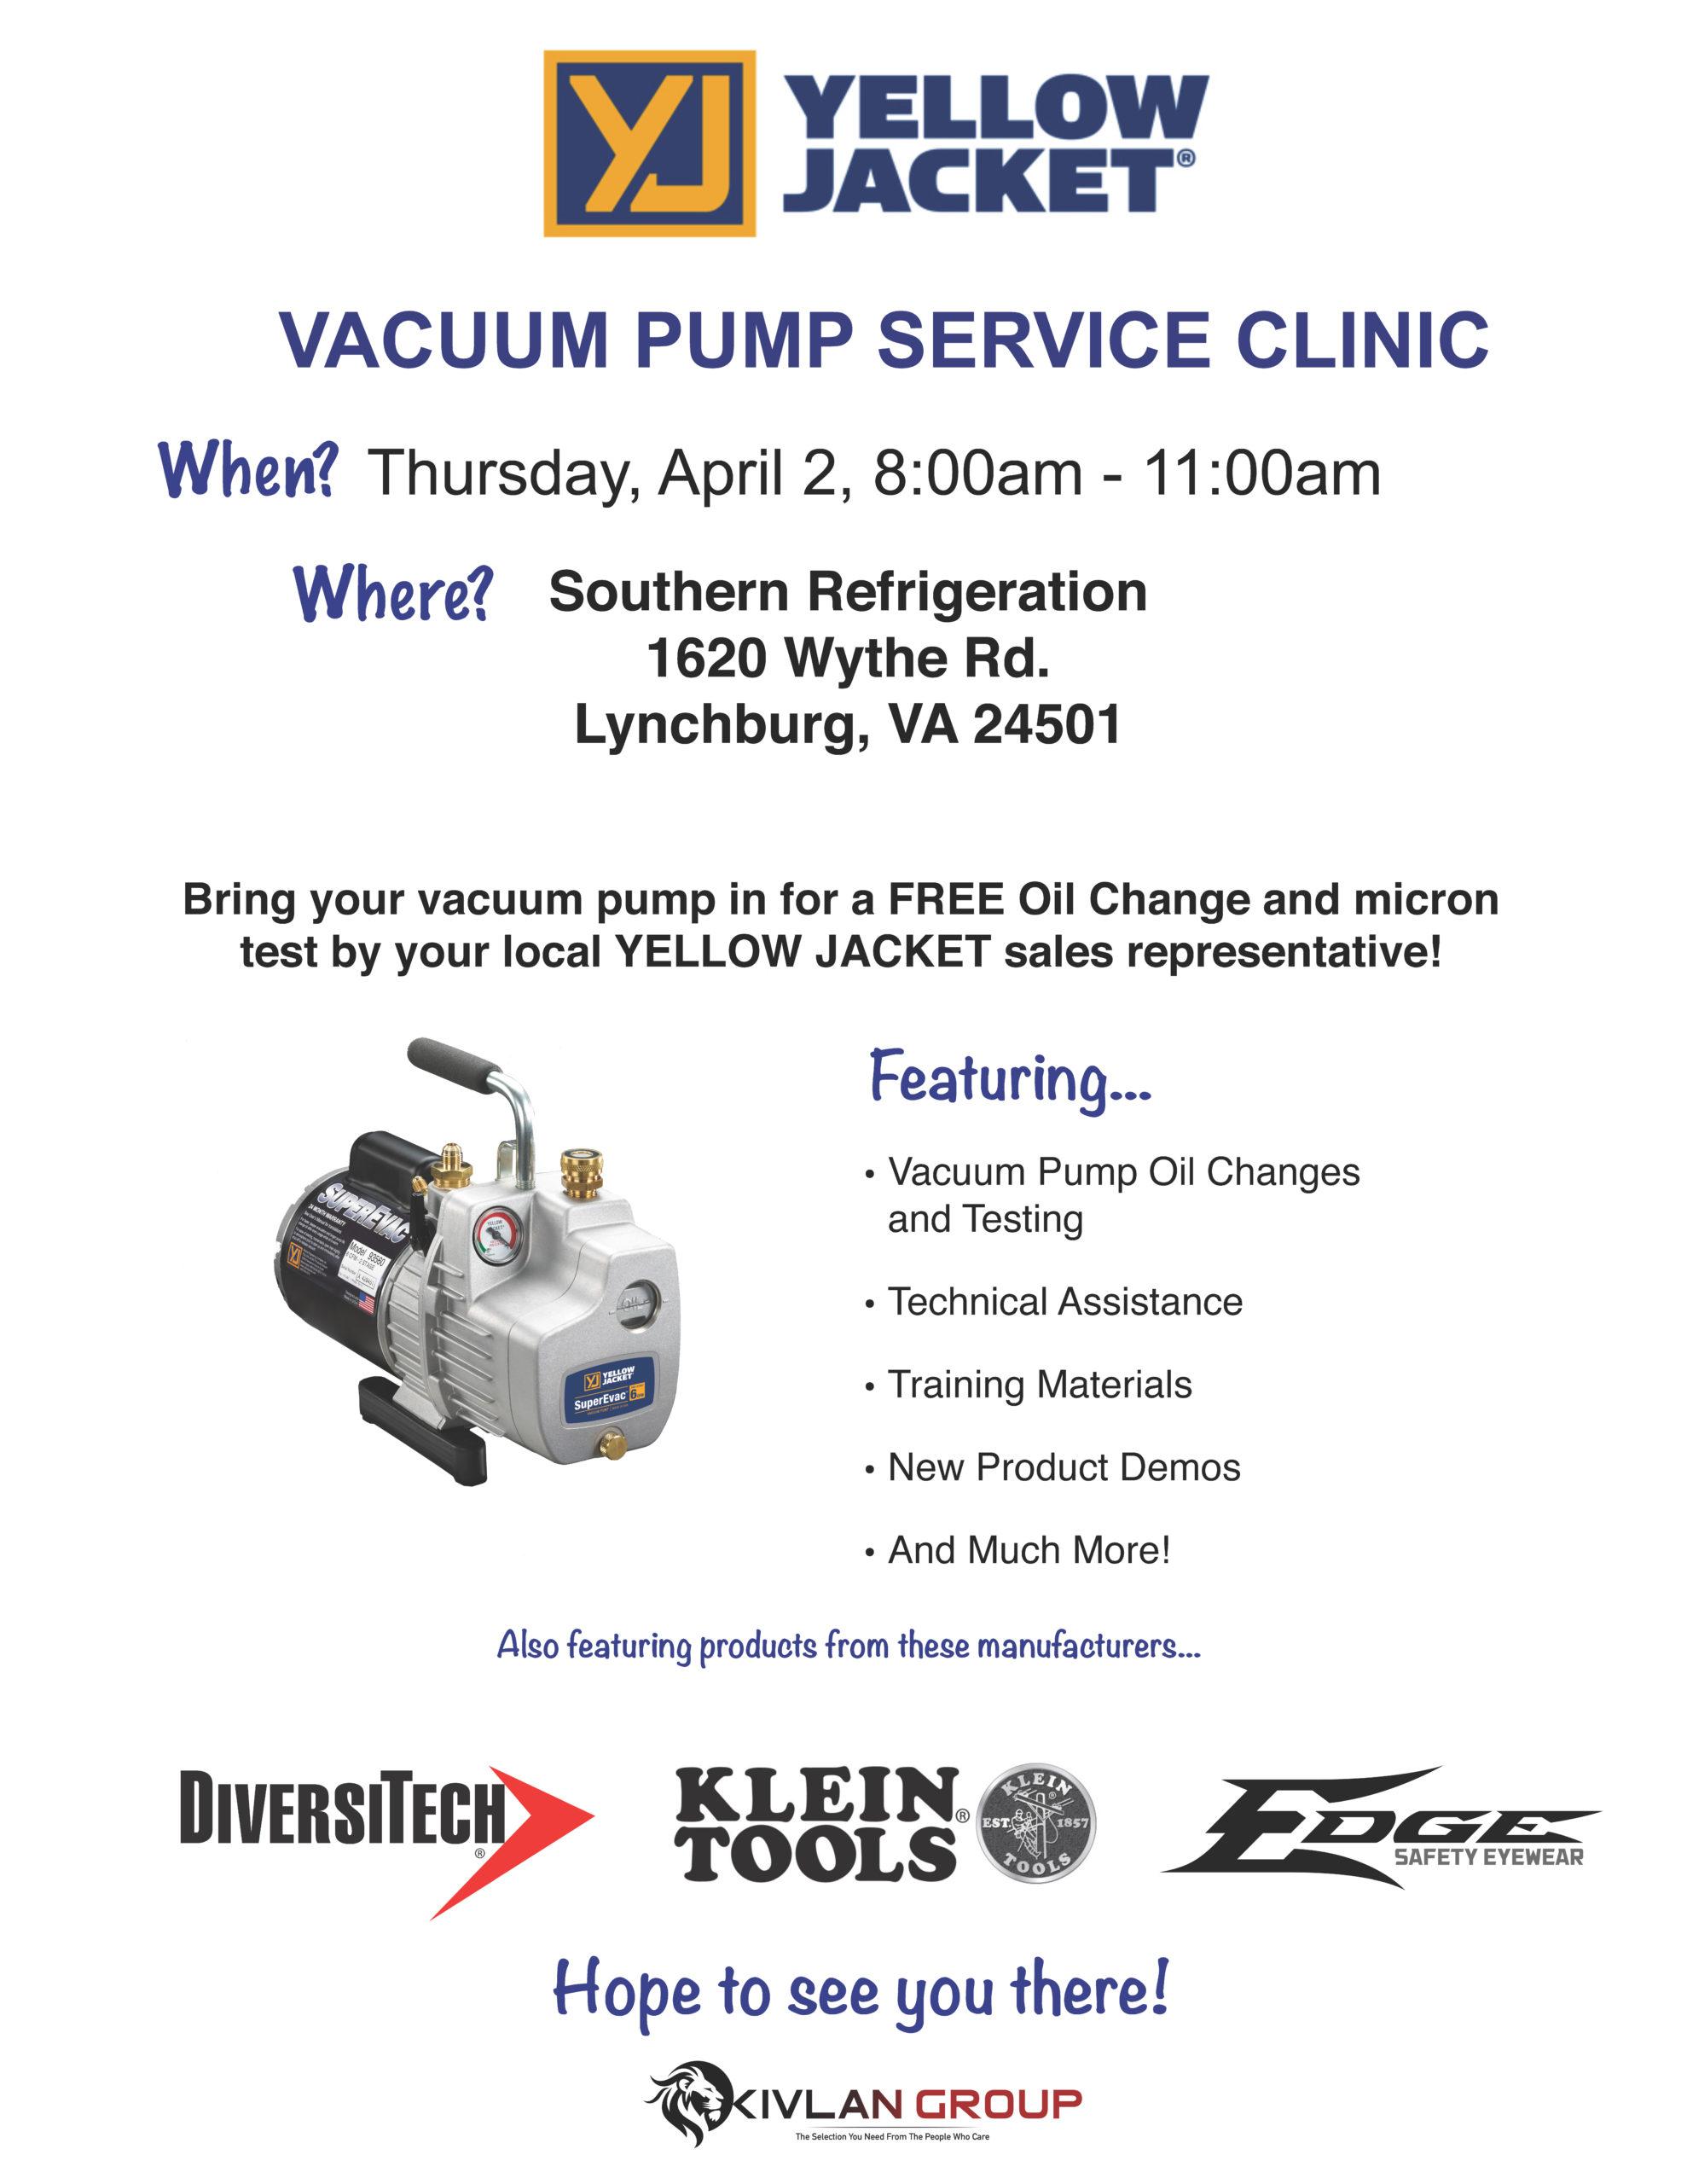 Yellow Jacket Vacuum Pump Service – Lynchburg @ Southern Refrigeration - Lynchburg